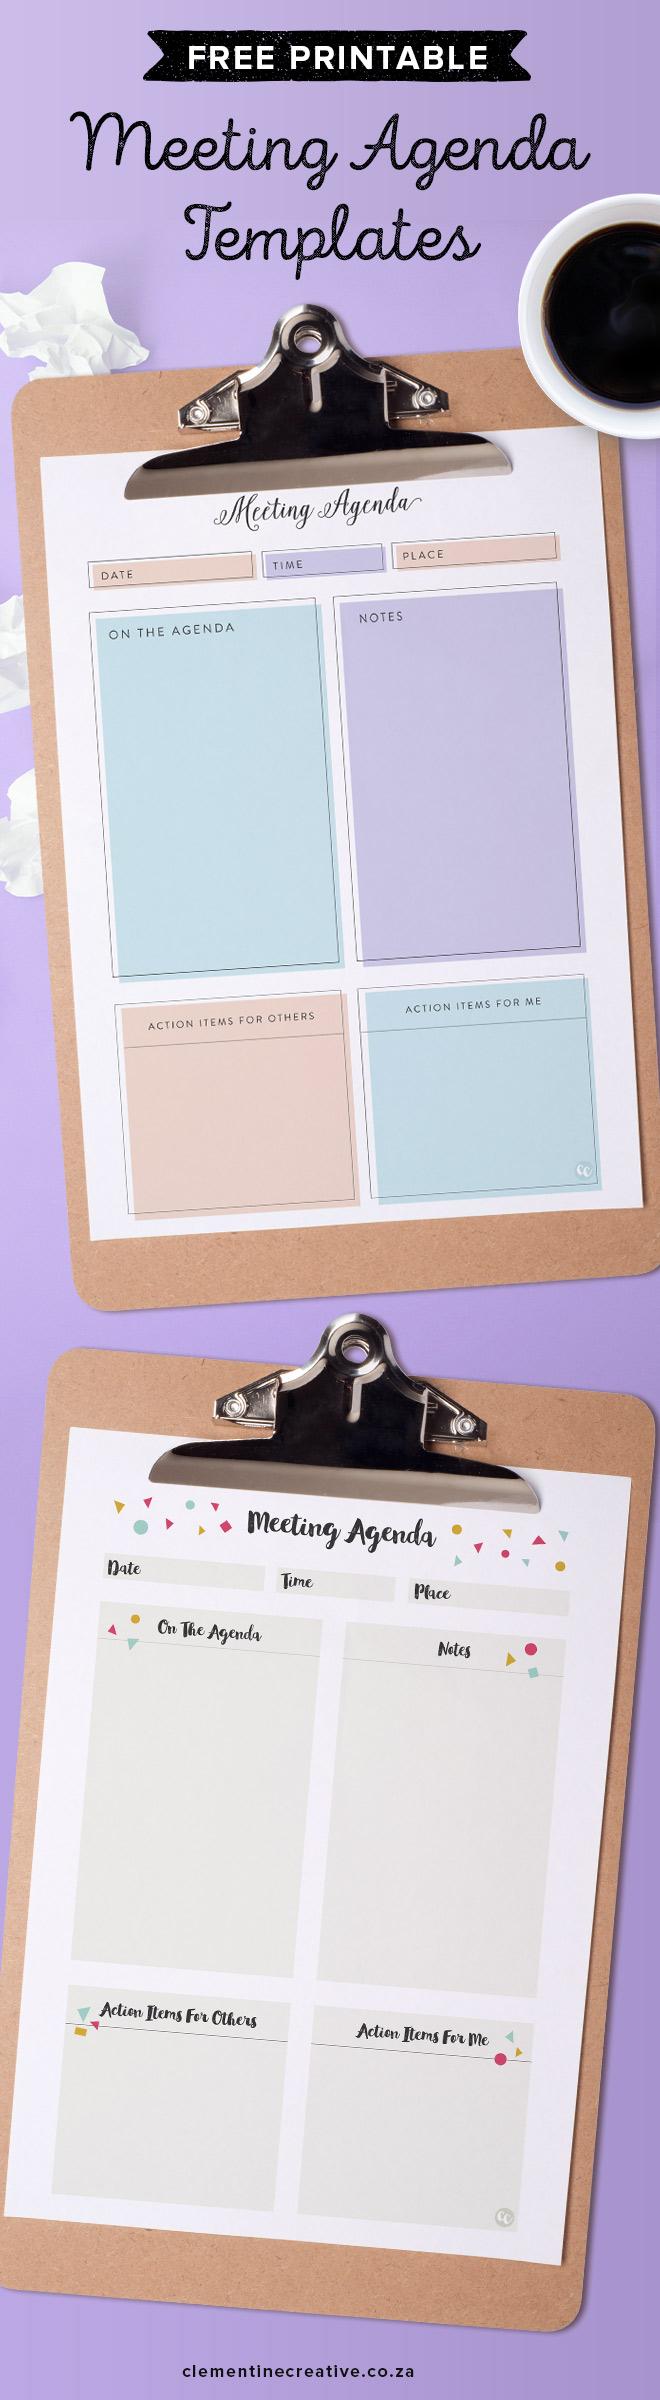 free pretty printable meeting agenda templates. Black Bedroom Furniture Sets. Home Design Ideas